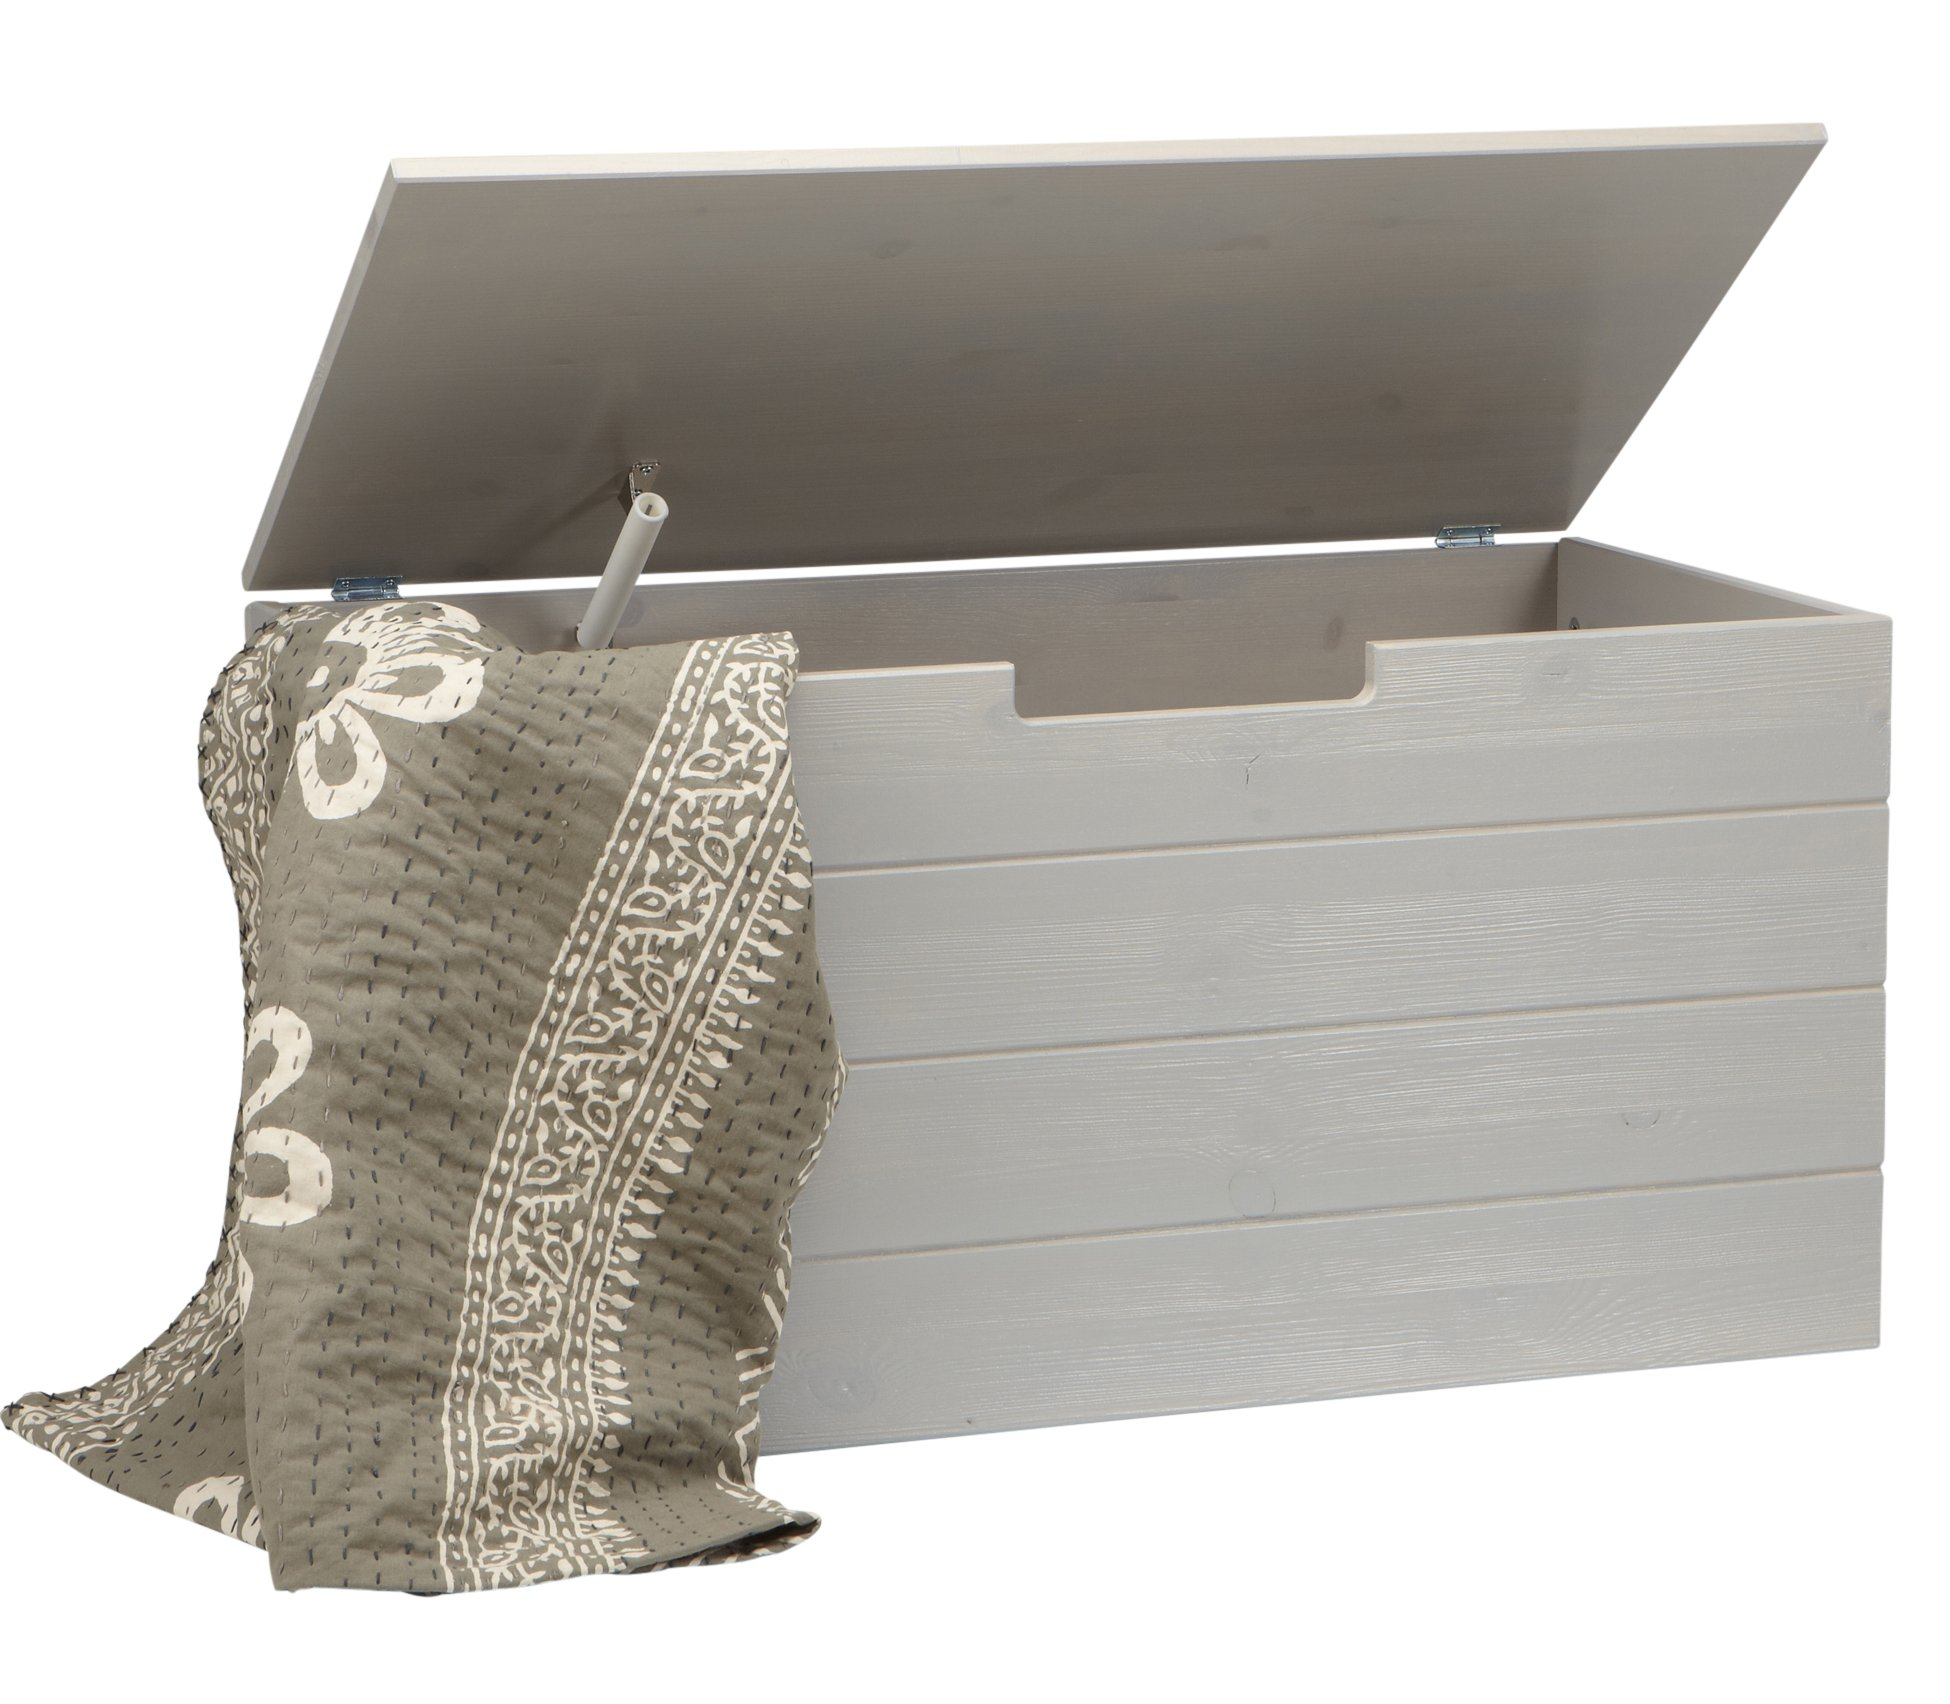 Mortimer Toy Box - Brushed Pebble Grey - Nest Designs